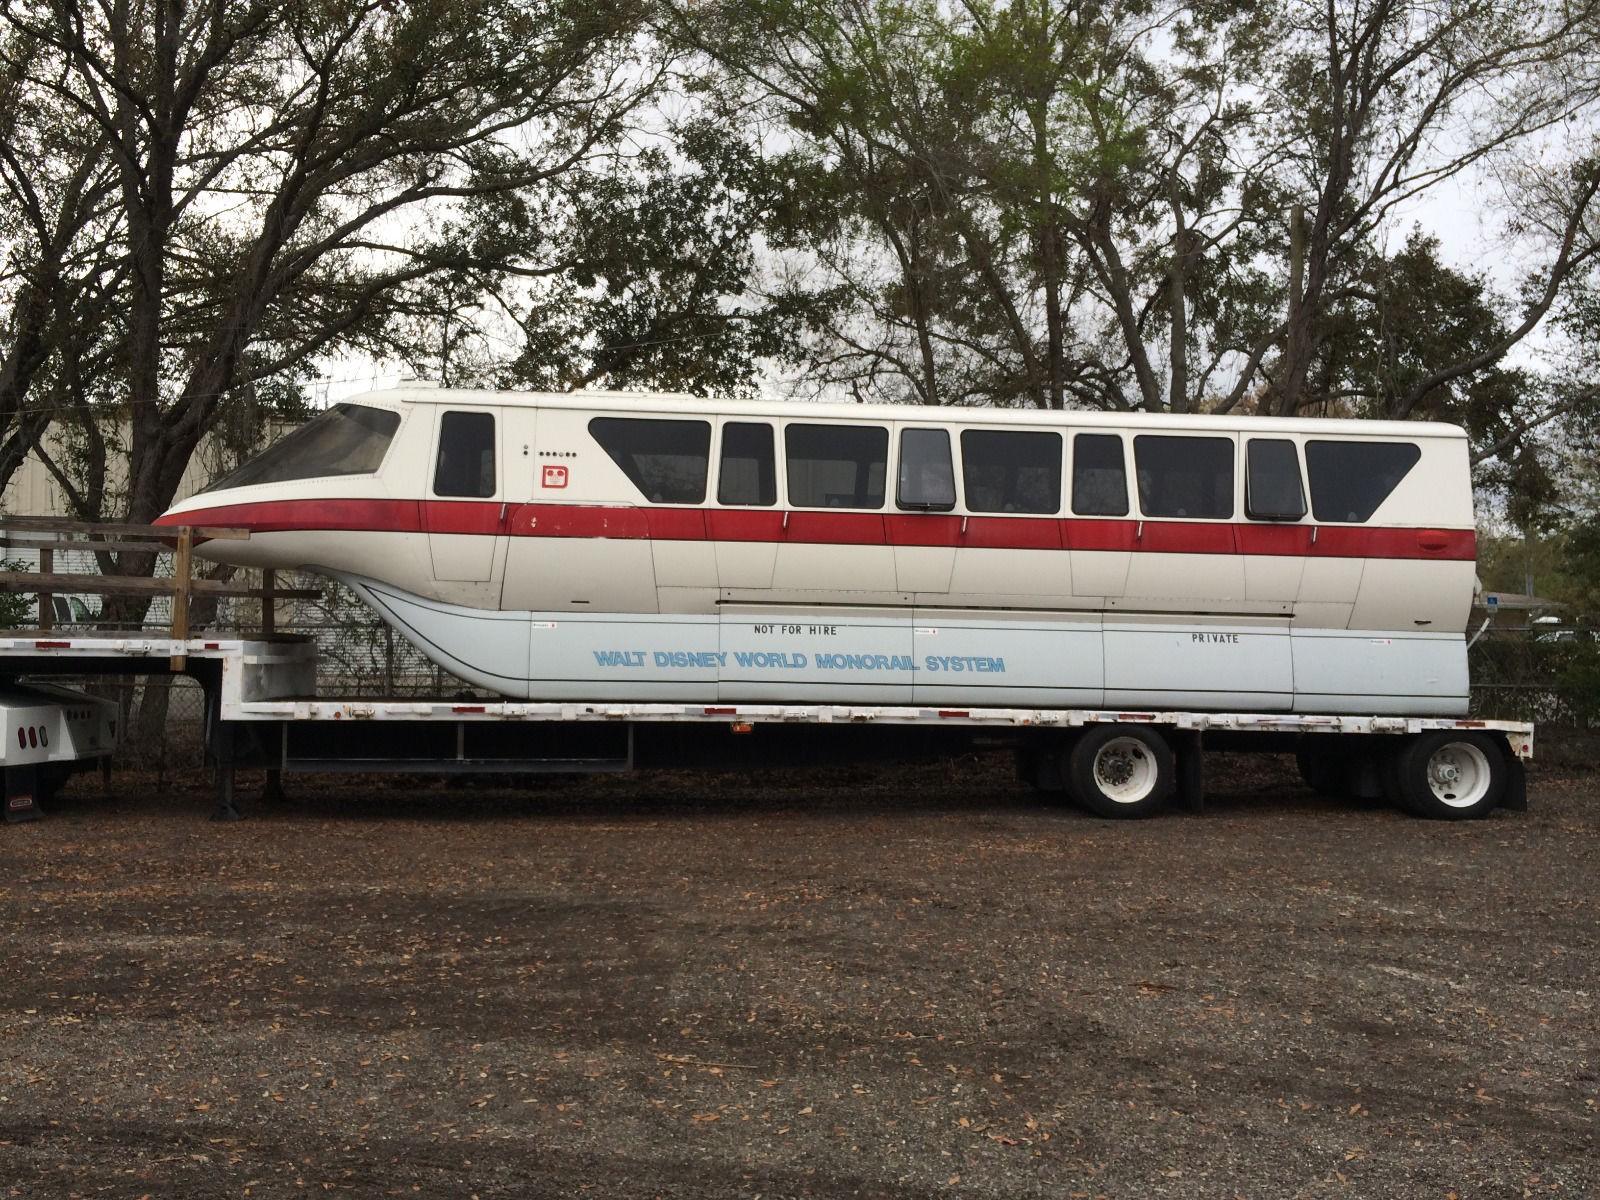 Walt Disney World Monorail car for sale on eBay | Blogs